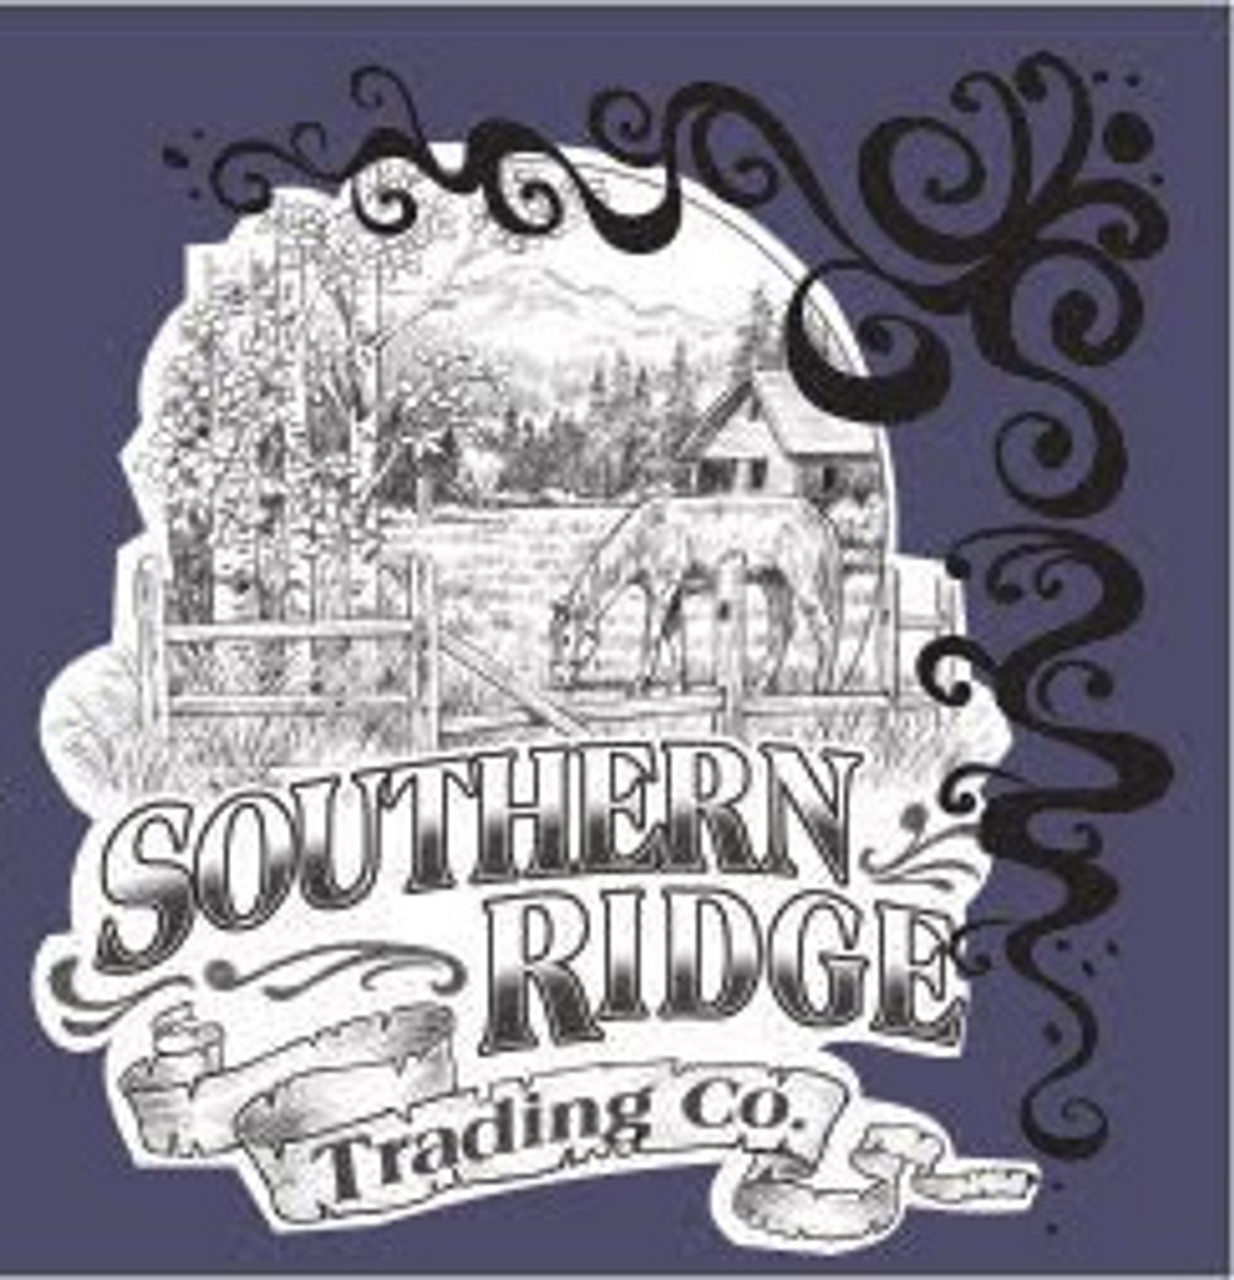 Southern Ridge Trading Co